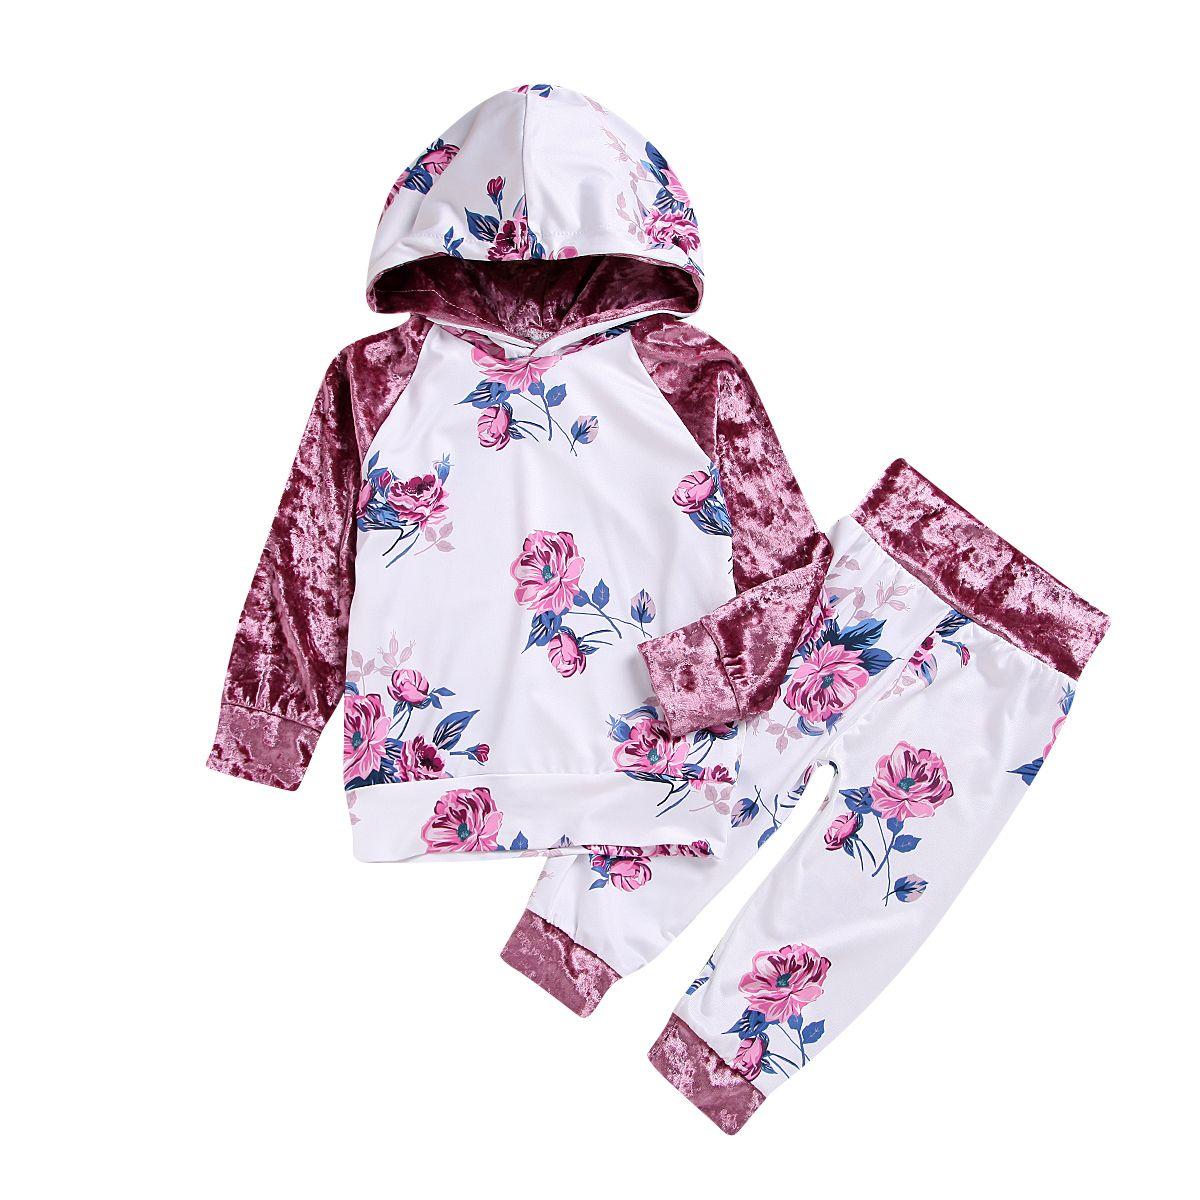 1e03ba37d6c3 2019 Kid Girls Clothes Pink Flower Hooded Velvet Outfits Tops+Pants ...